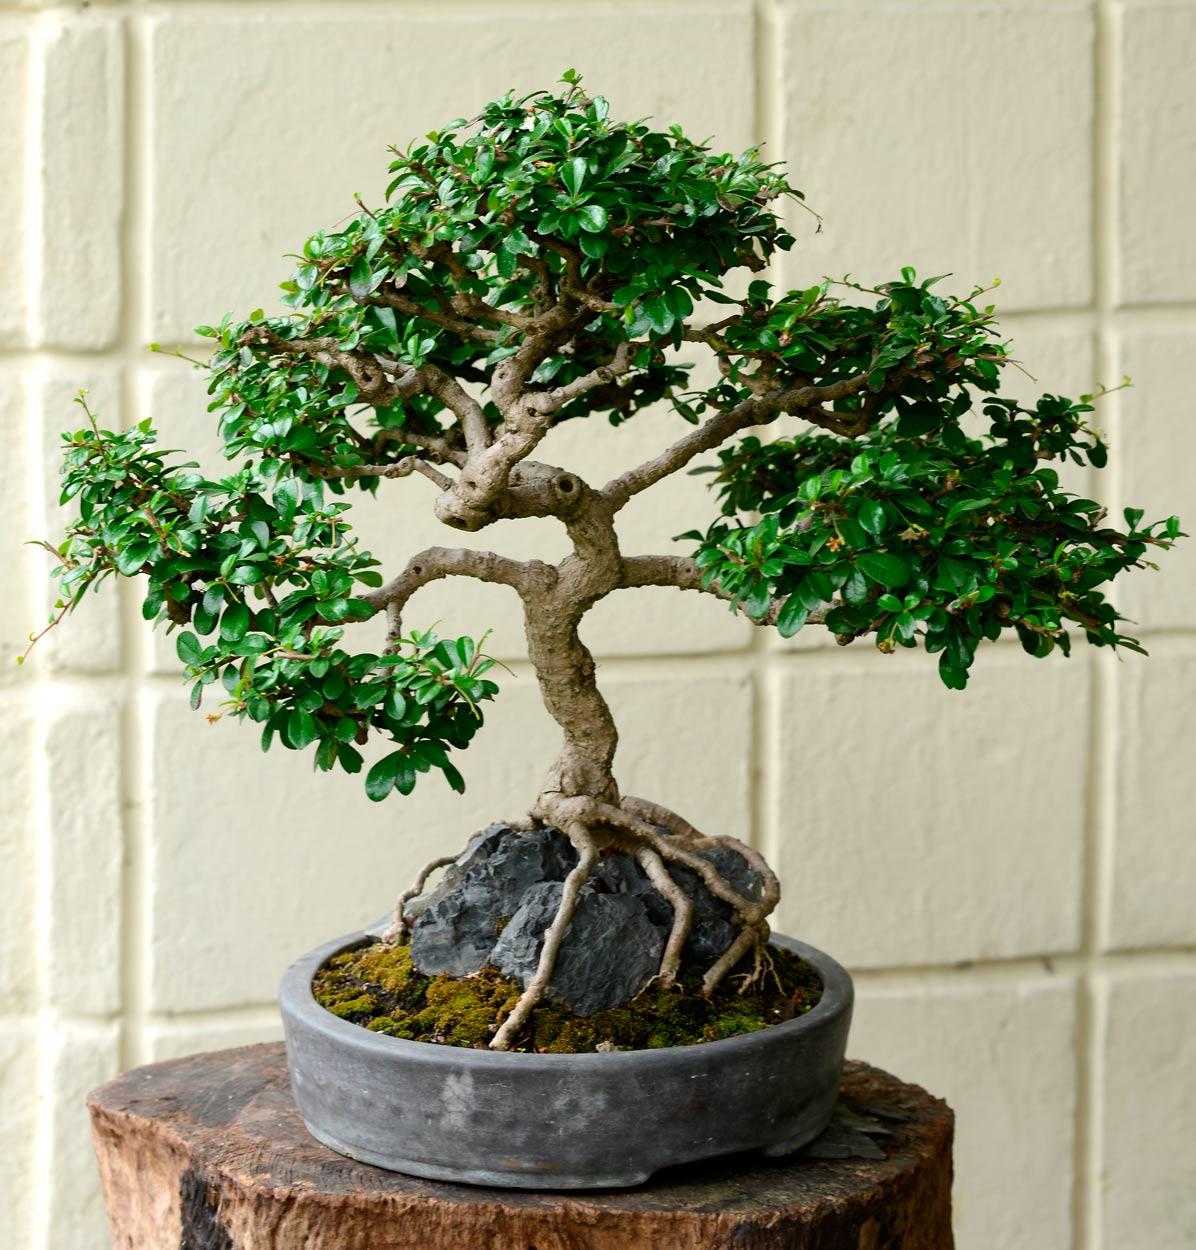 Bons is el arte de la paciencia ecolog a la revista el universo - Cultivo del bonsai ...